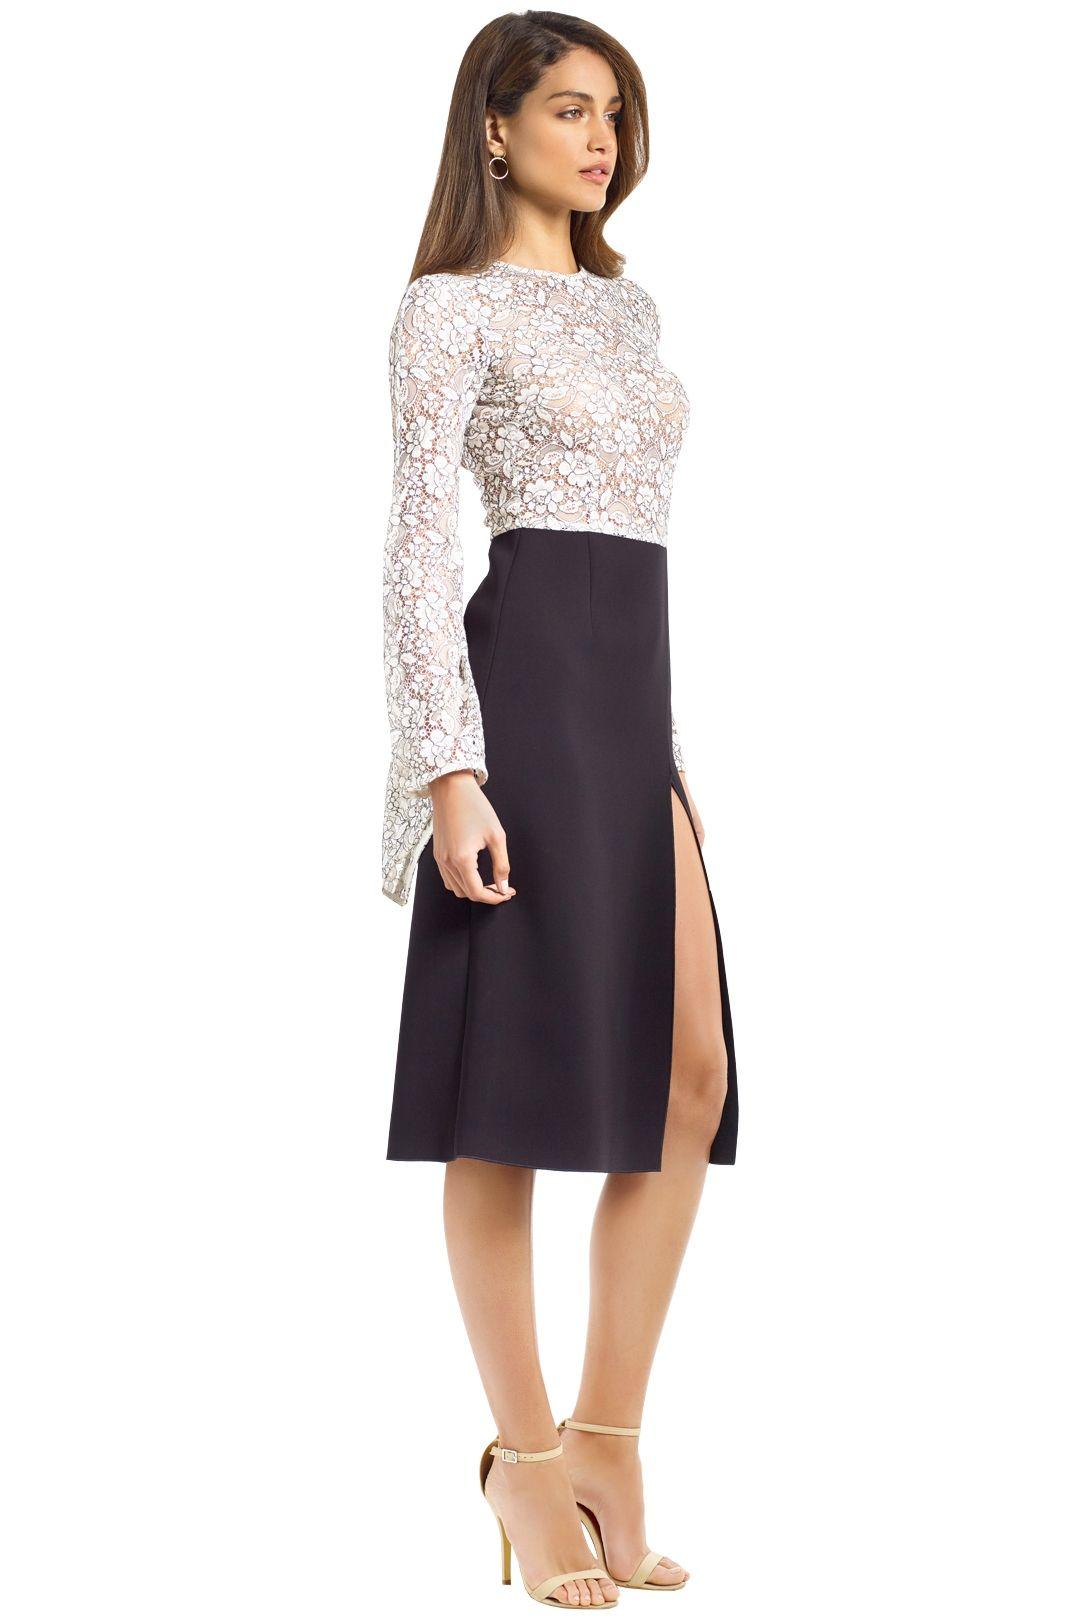 Yeojin Bae - Elise Corded Lace Dress - Black White - Side